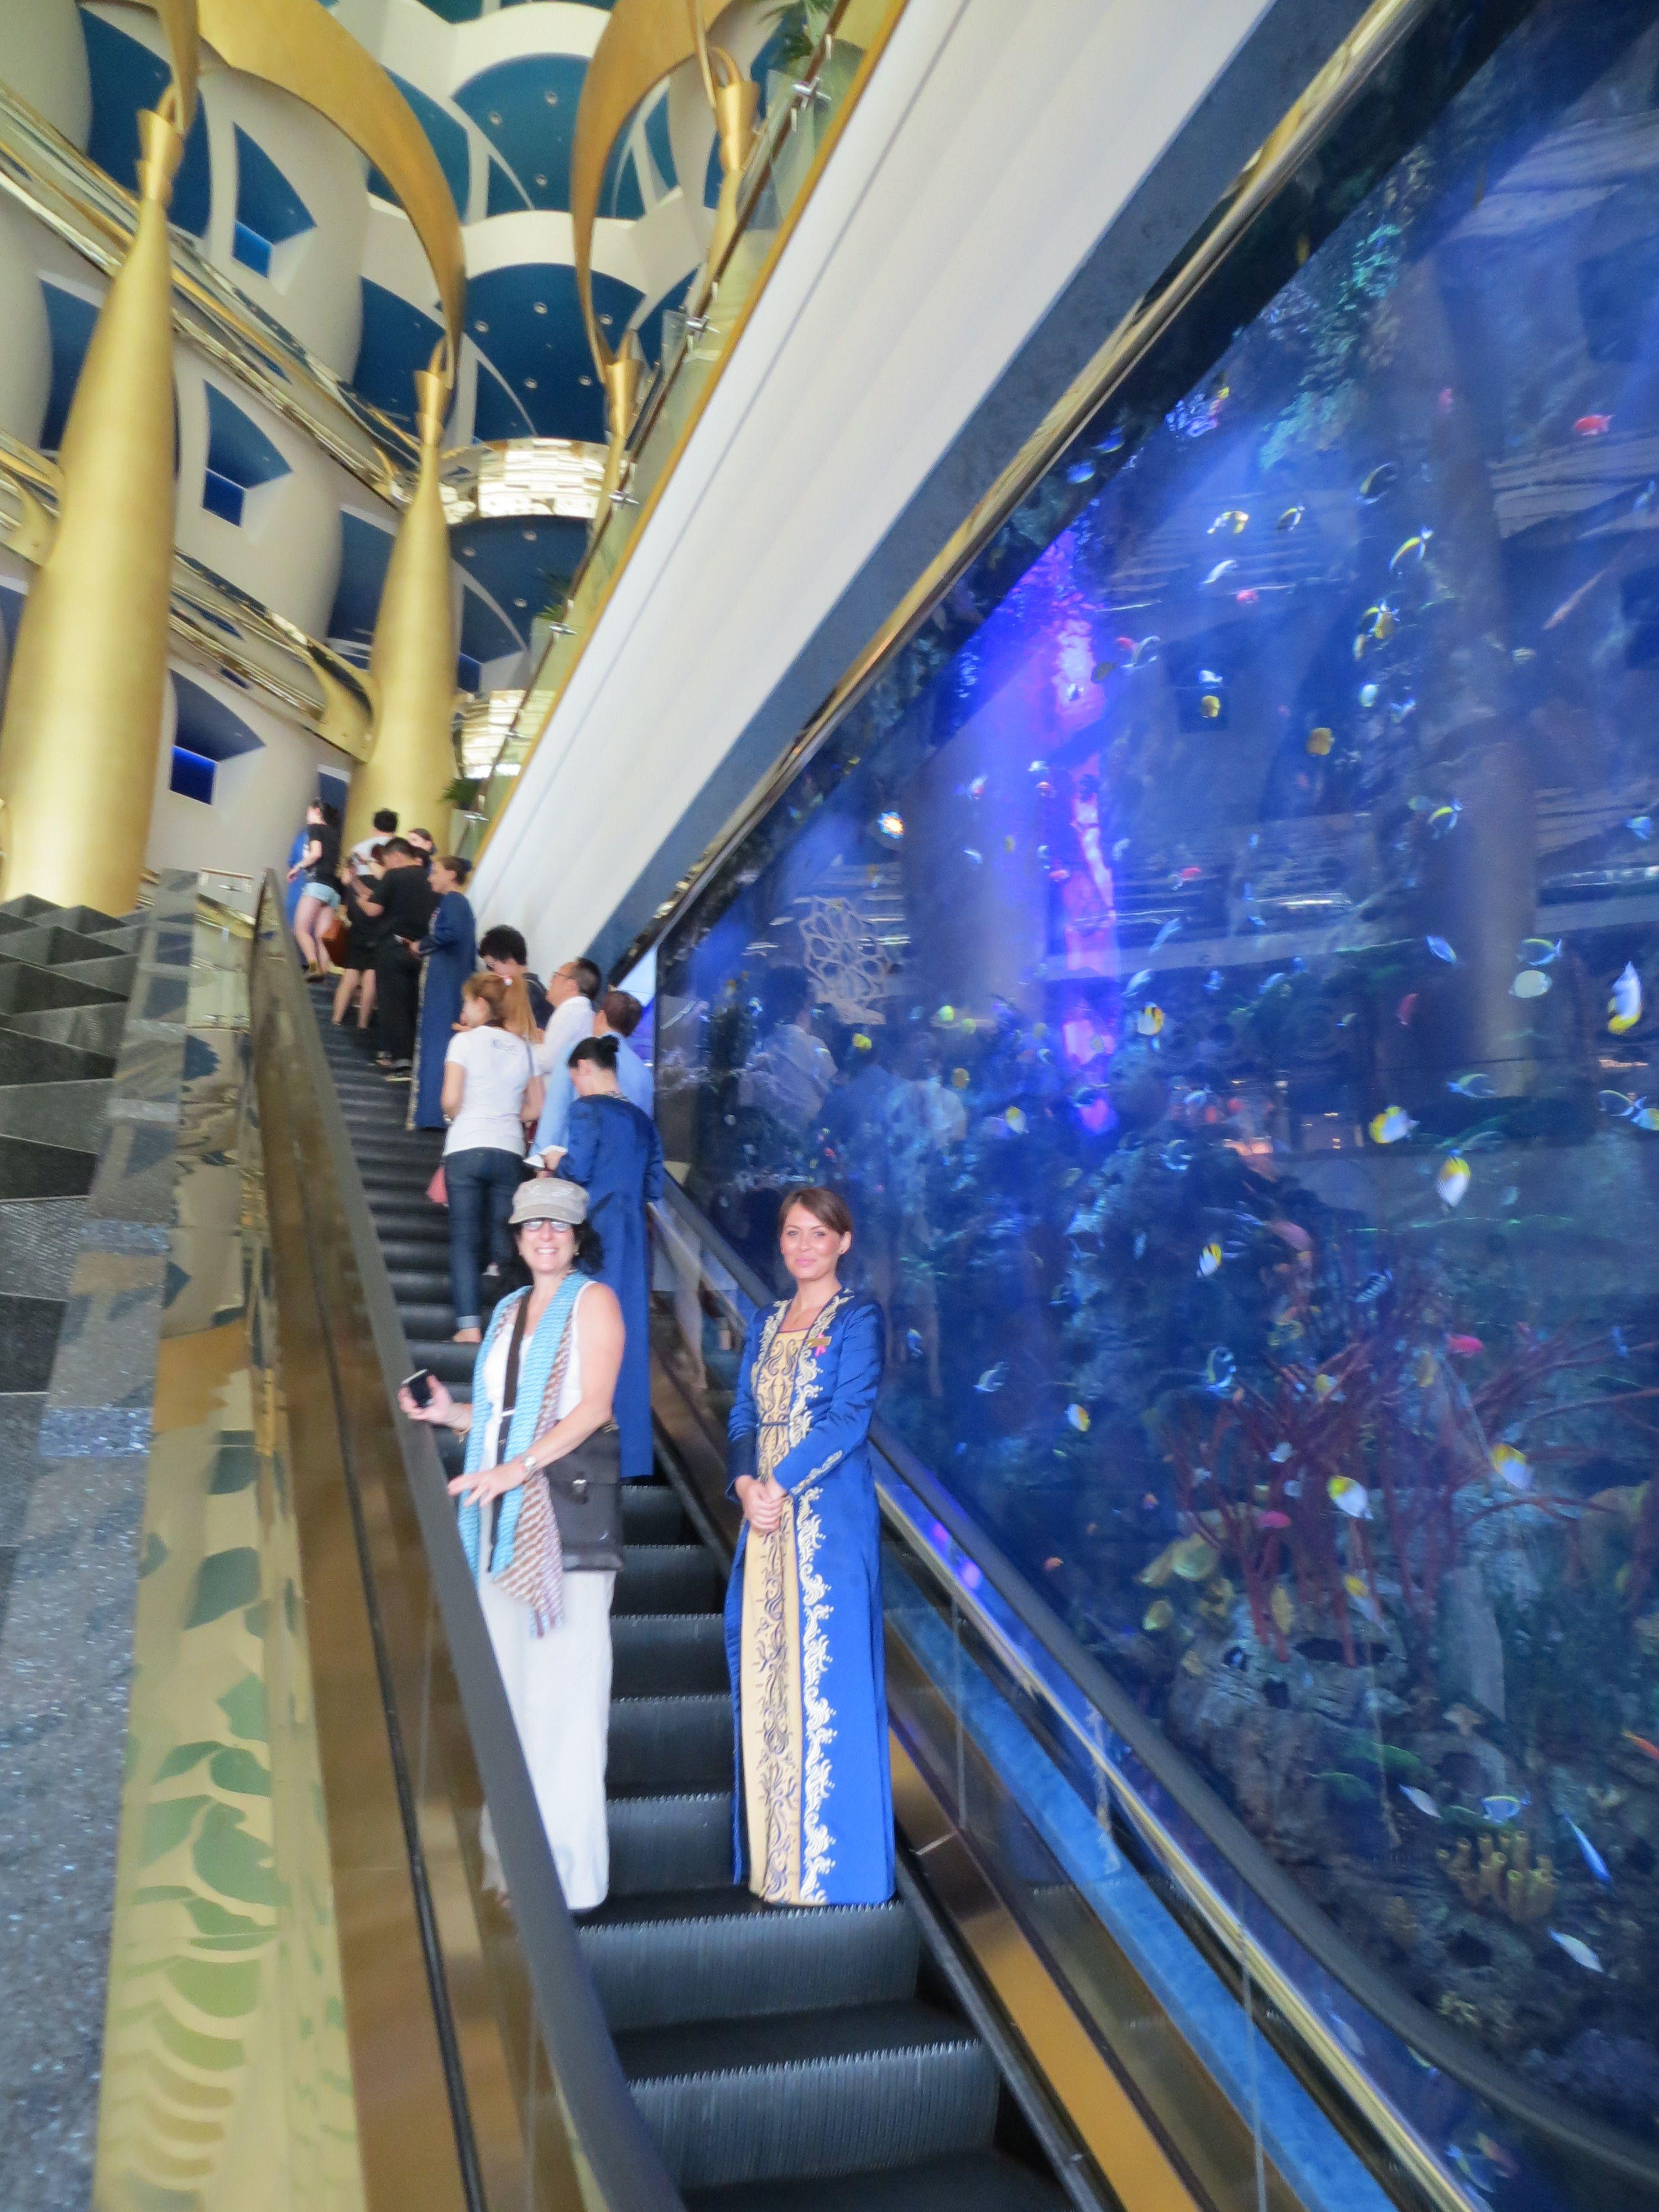 Lobby Entrance And Aquarium Burj Al Arab - Dubai' Sail